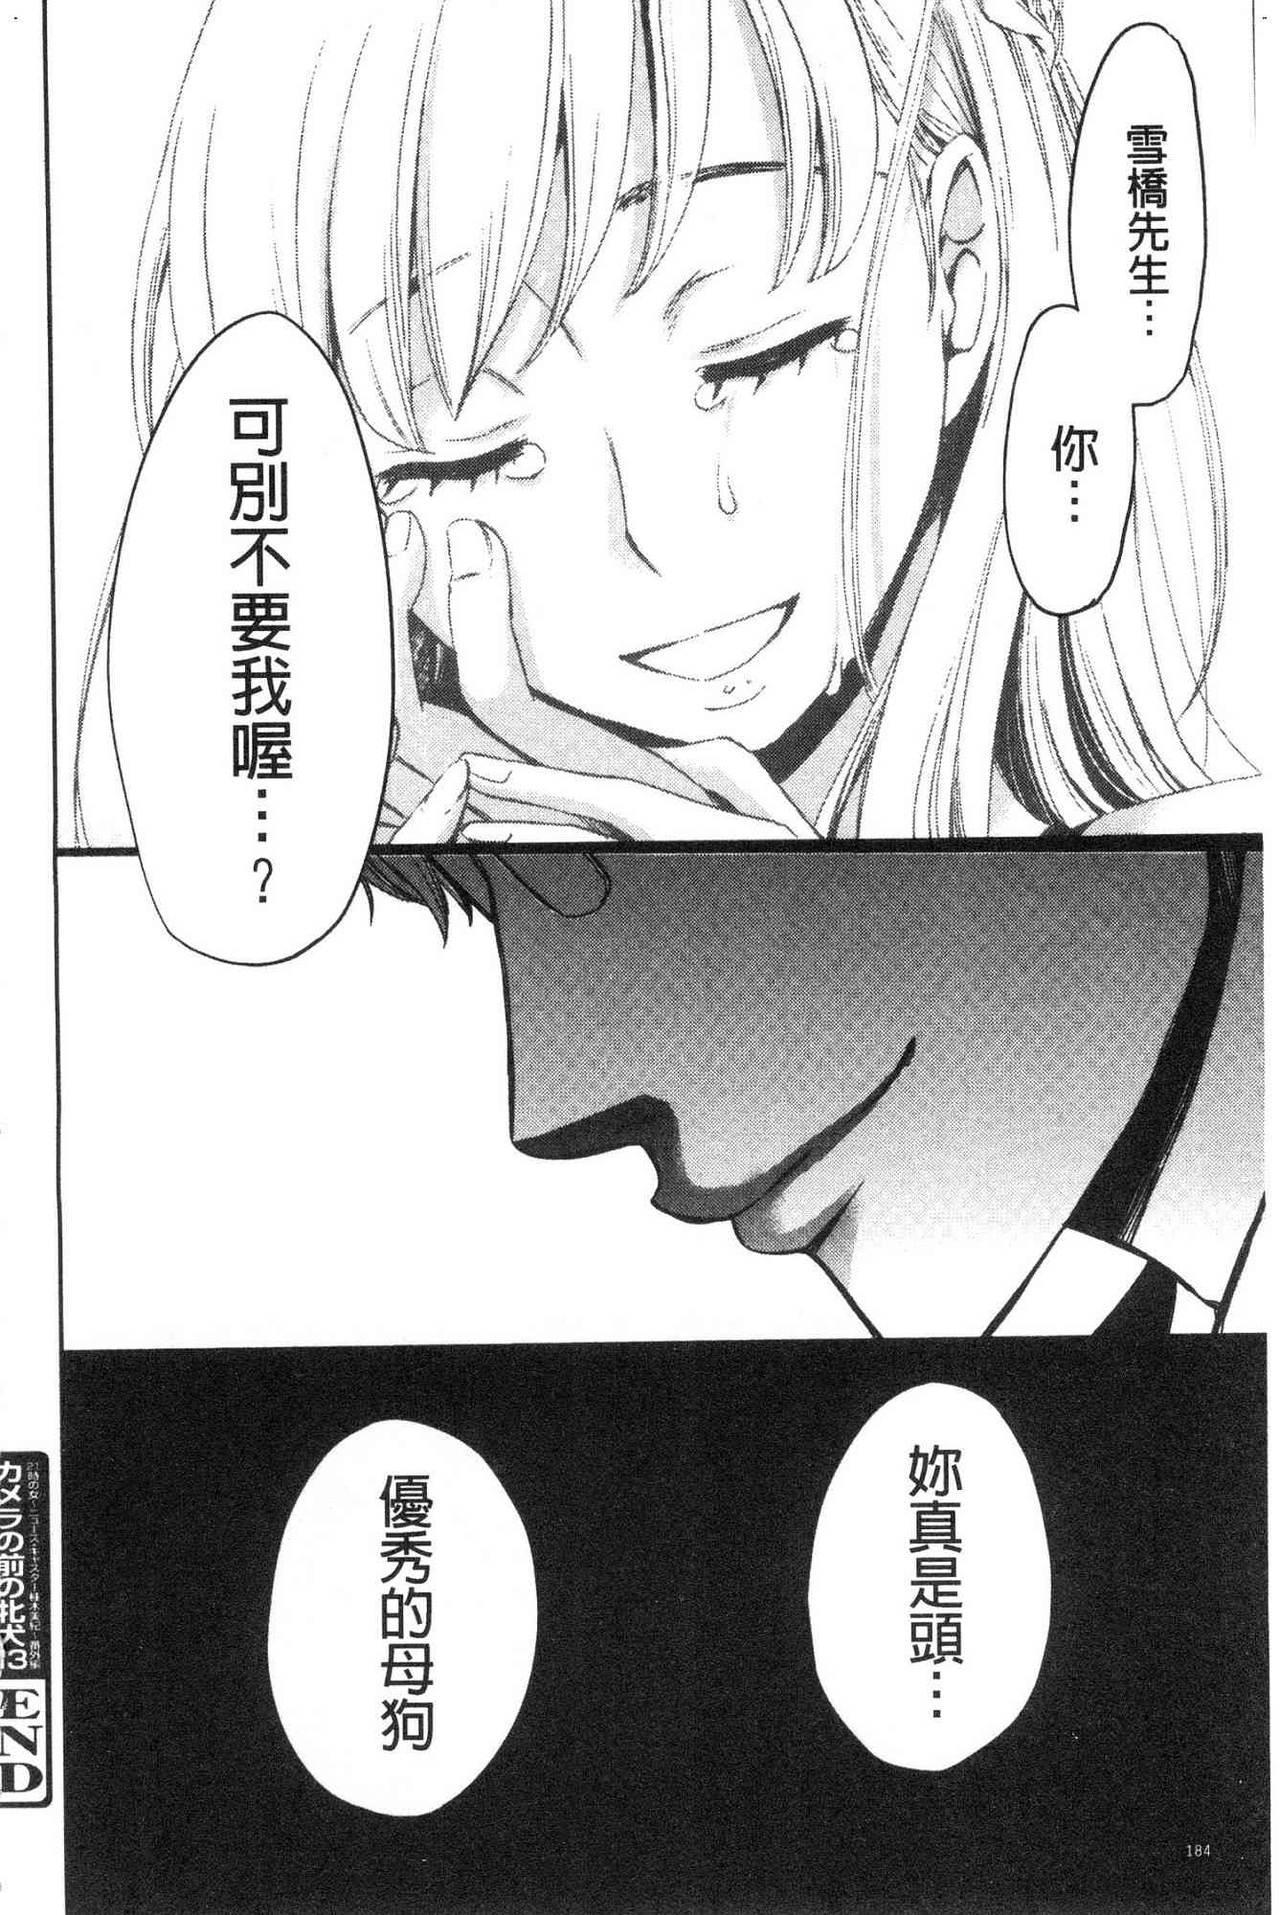 [Gotoh Akira]  21-ji no Onna ~Camera no Mae no Mesuinu~ 2 | 21時之女 ~鏡頭前的牝犬~ 2 [Chinese] 185